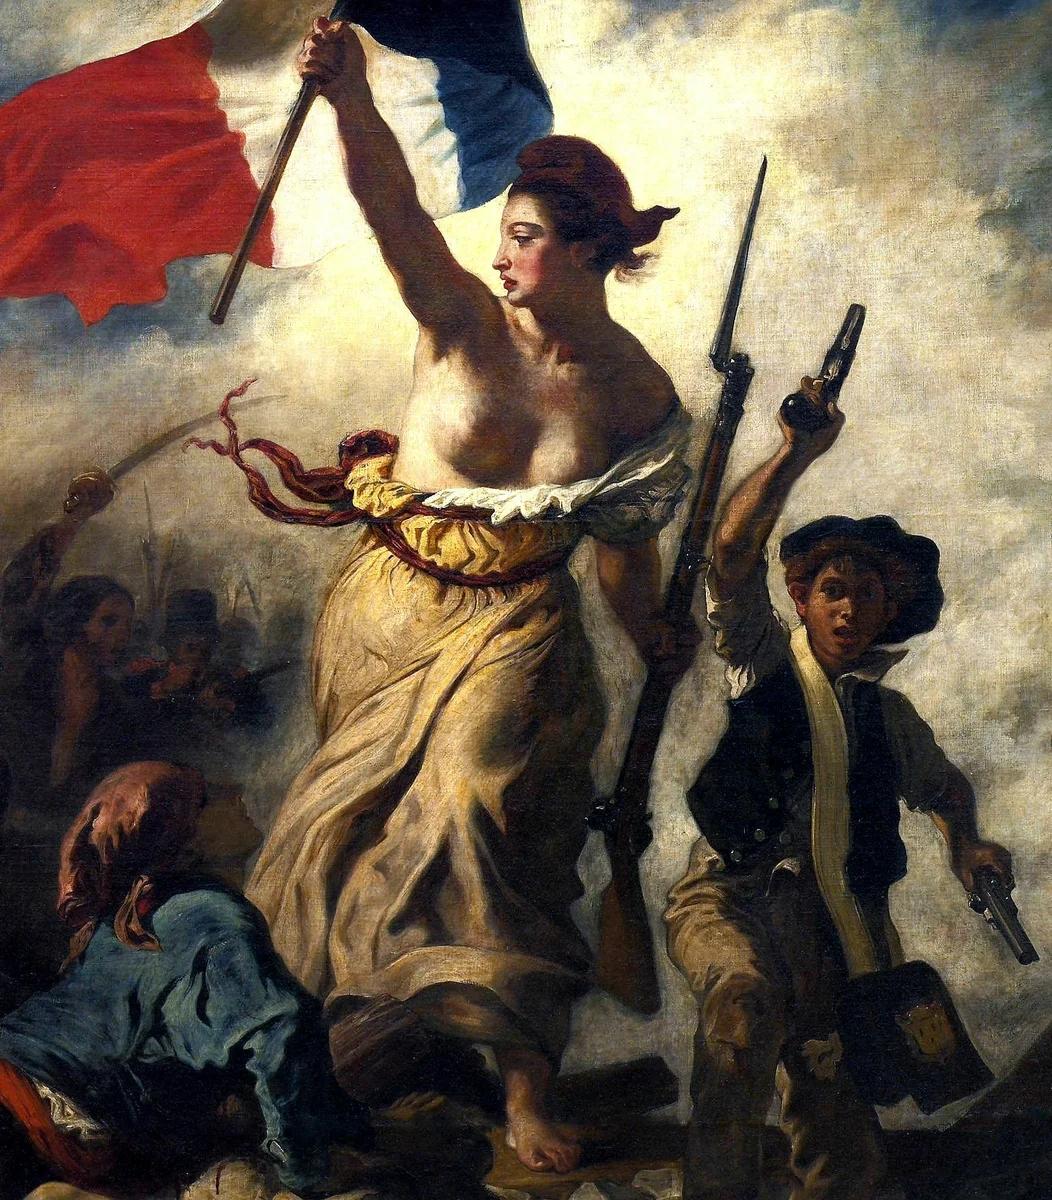 """Свобода на баррикадах"" - Э. Делакруа, фрагмент"